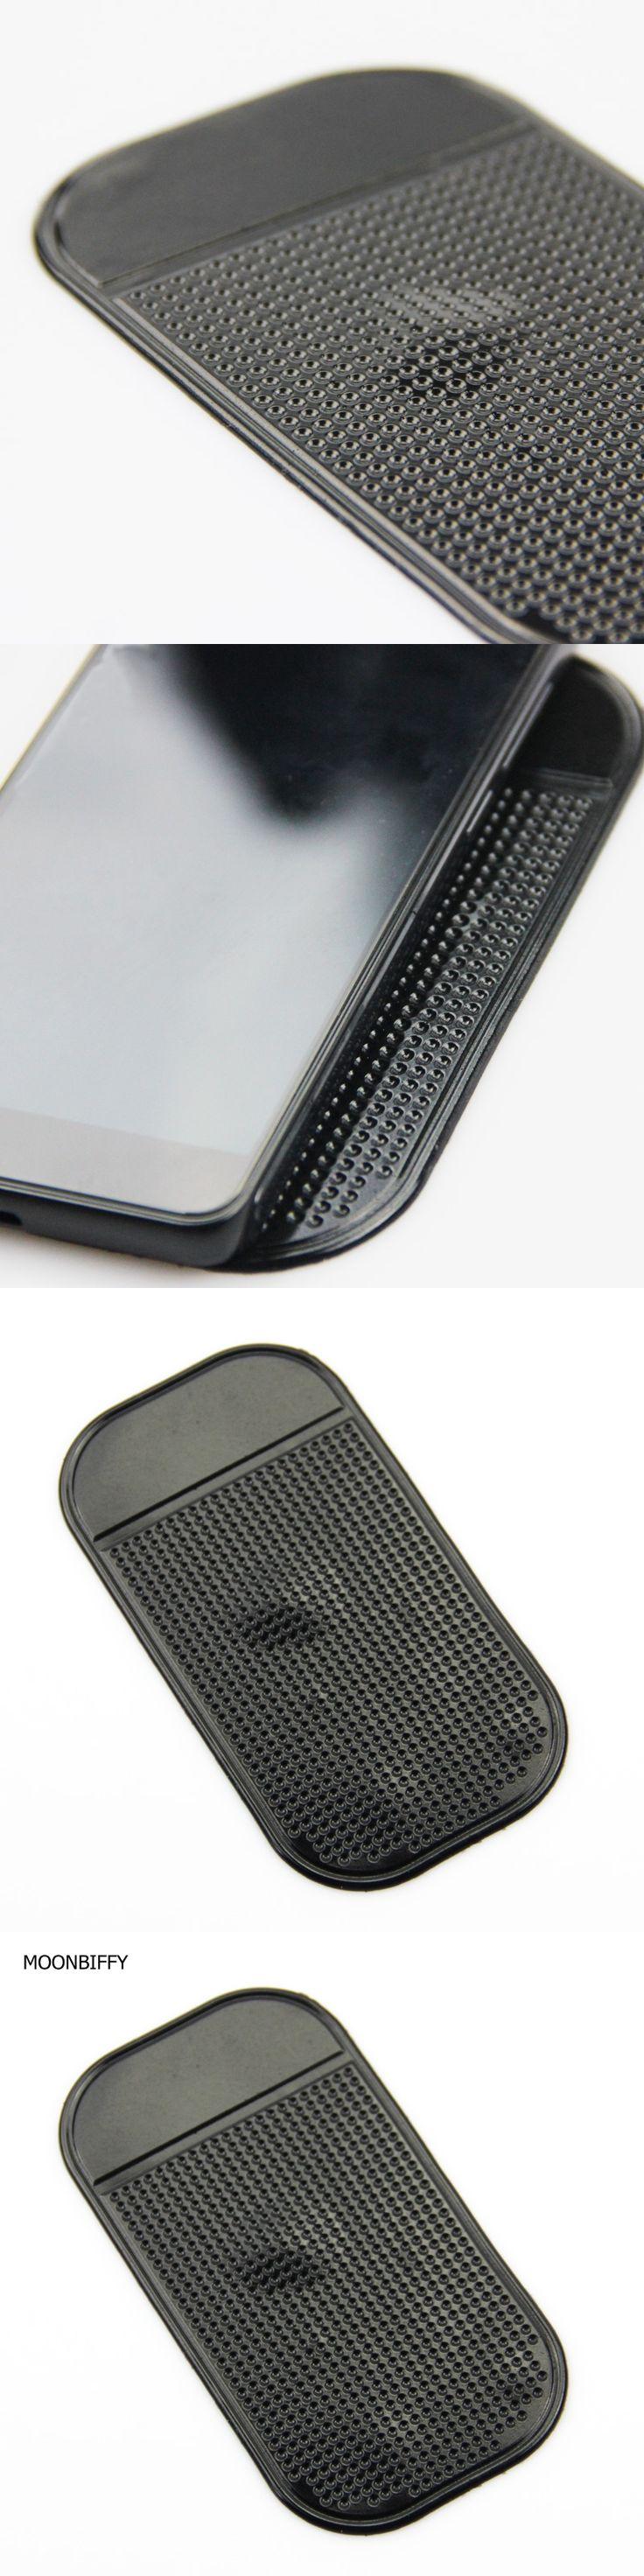 MOONBIFFY Anti-Slip Car Dashboard Sticky Pad Non-Slip Mat GPS Mobile Phone Holder Black Color